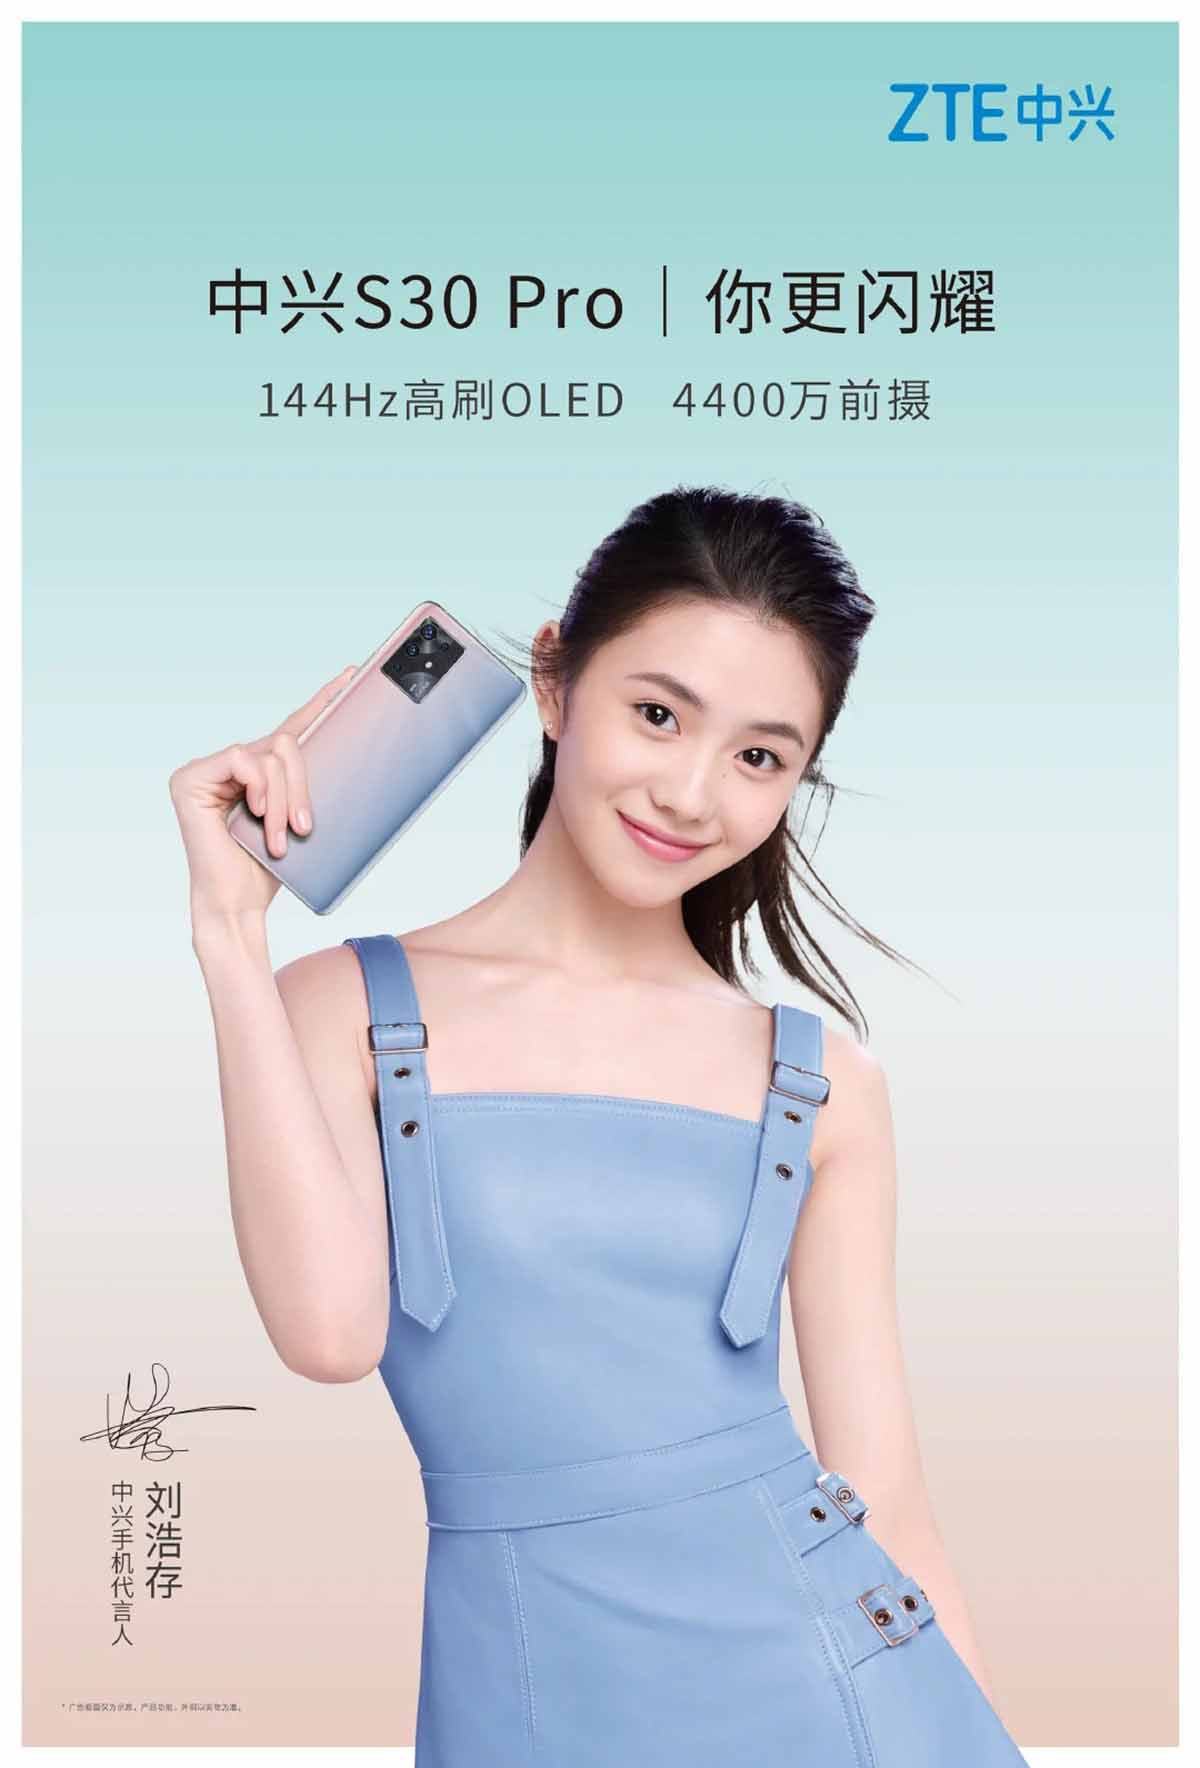 گوشی ZTE S30 Pro